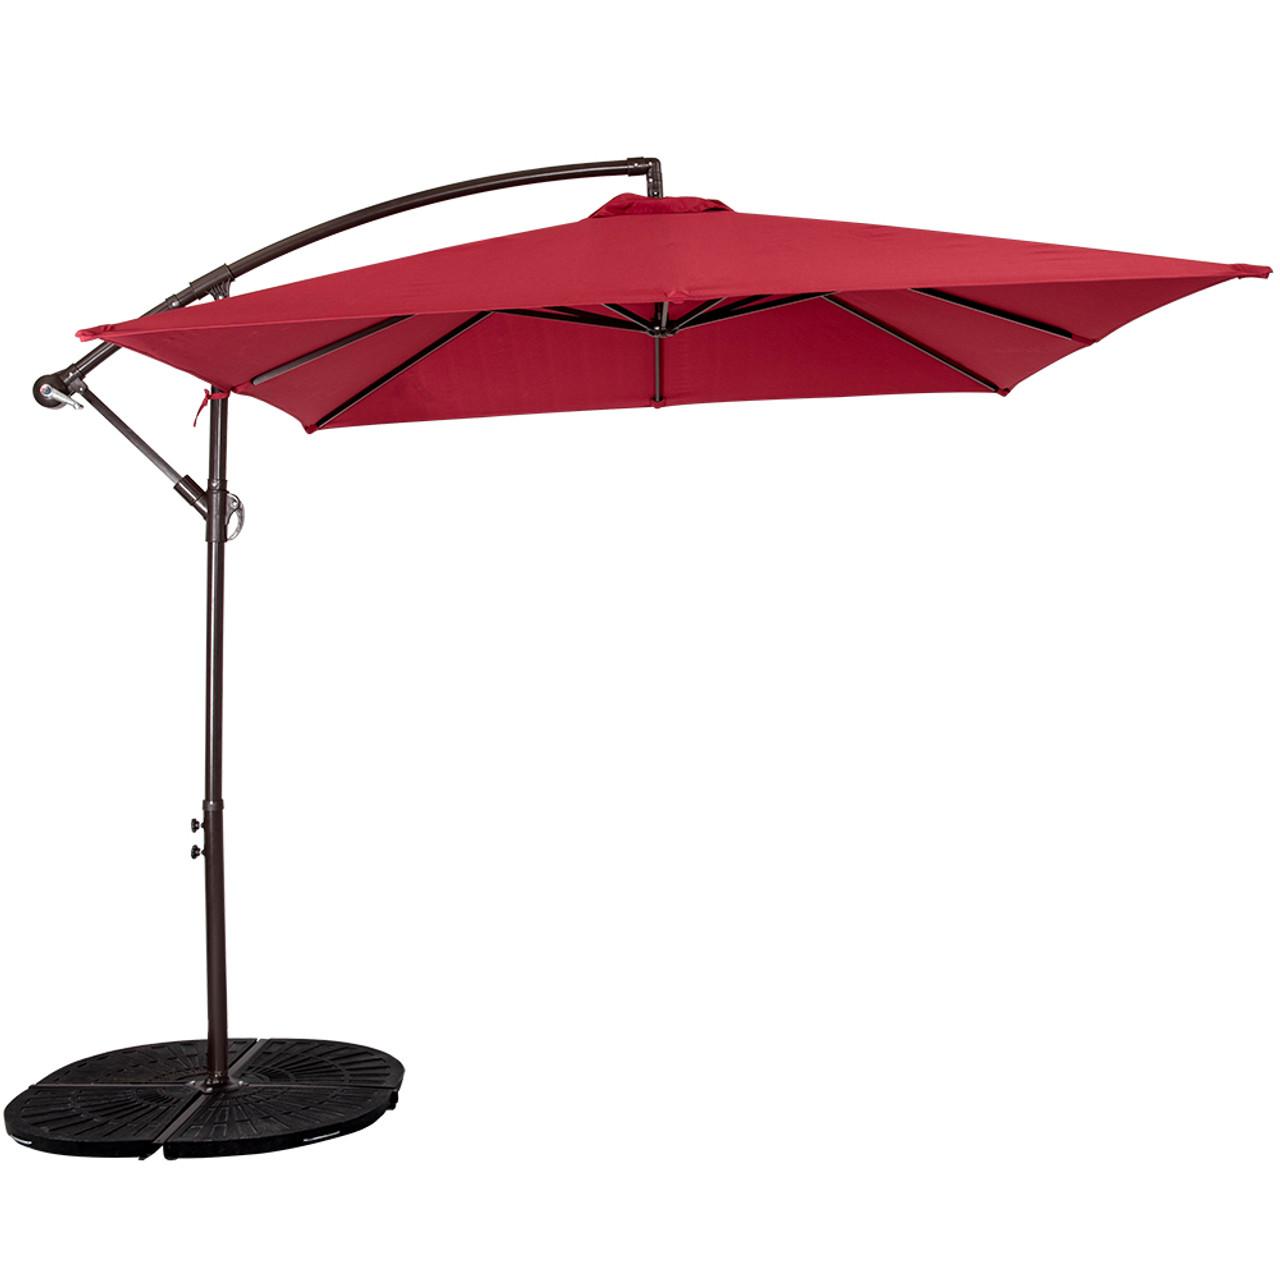 Patio Garden 8.2 x 8.2 FT Square Offset Patio Umbrella with Crank (Burgundy) - Patio Garden 8.2 X 8.2 FT Square Offset Patio Umbrella With Crank